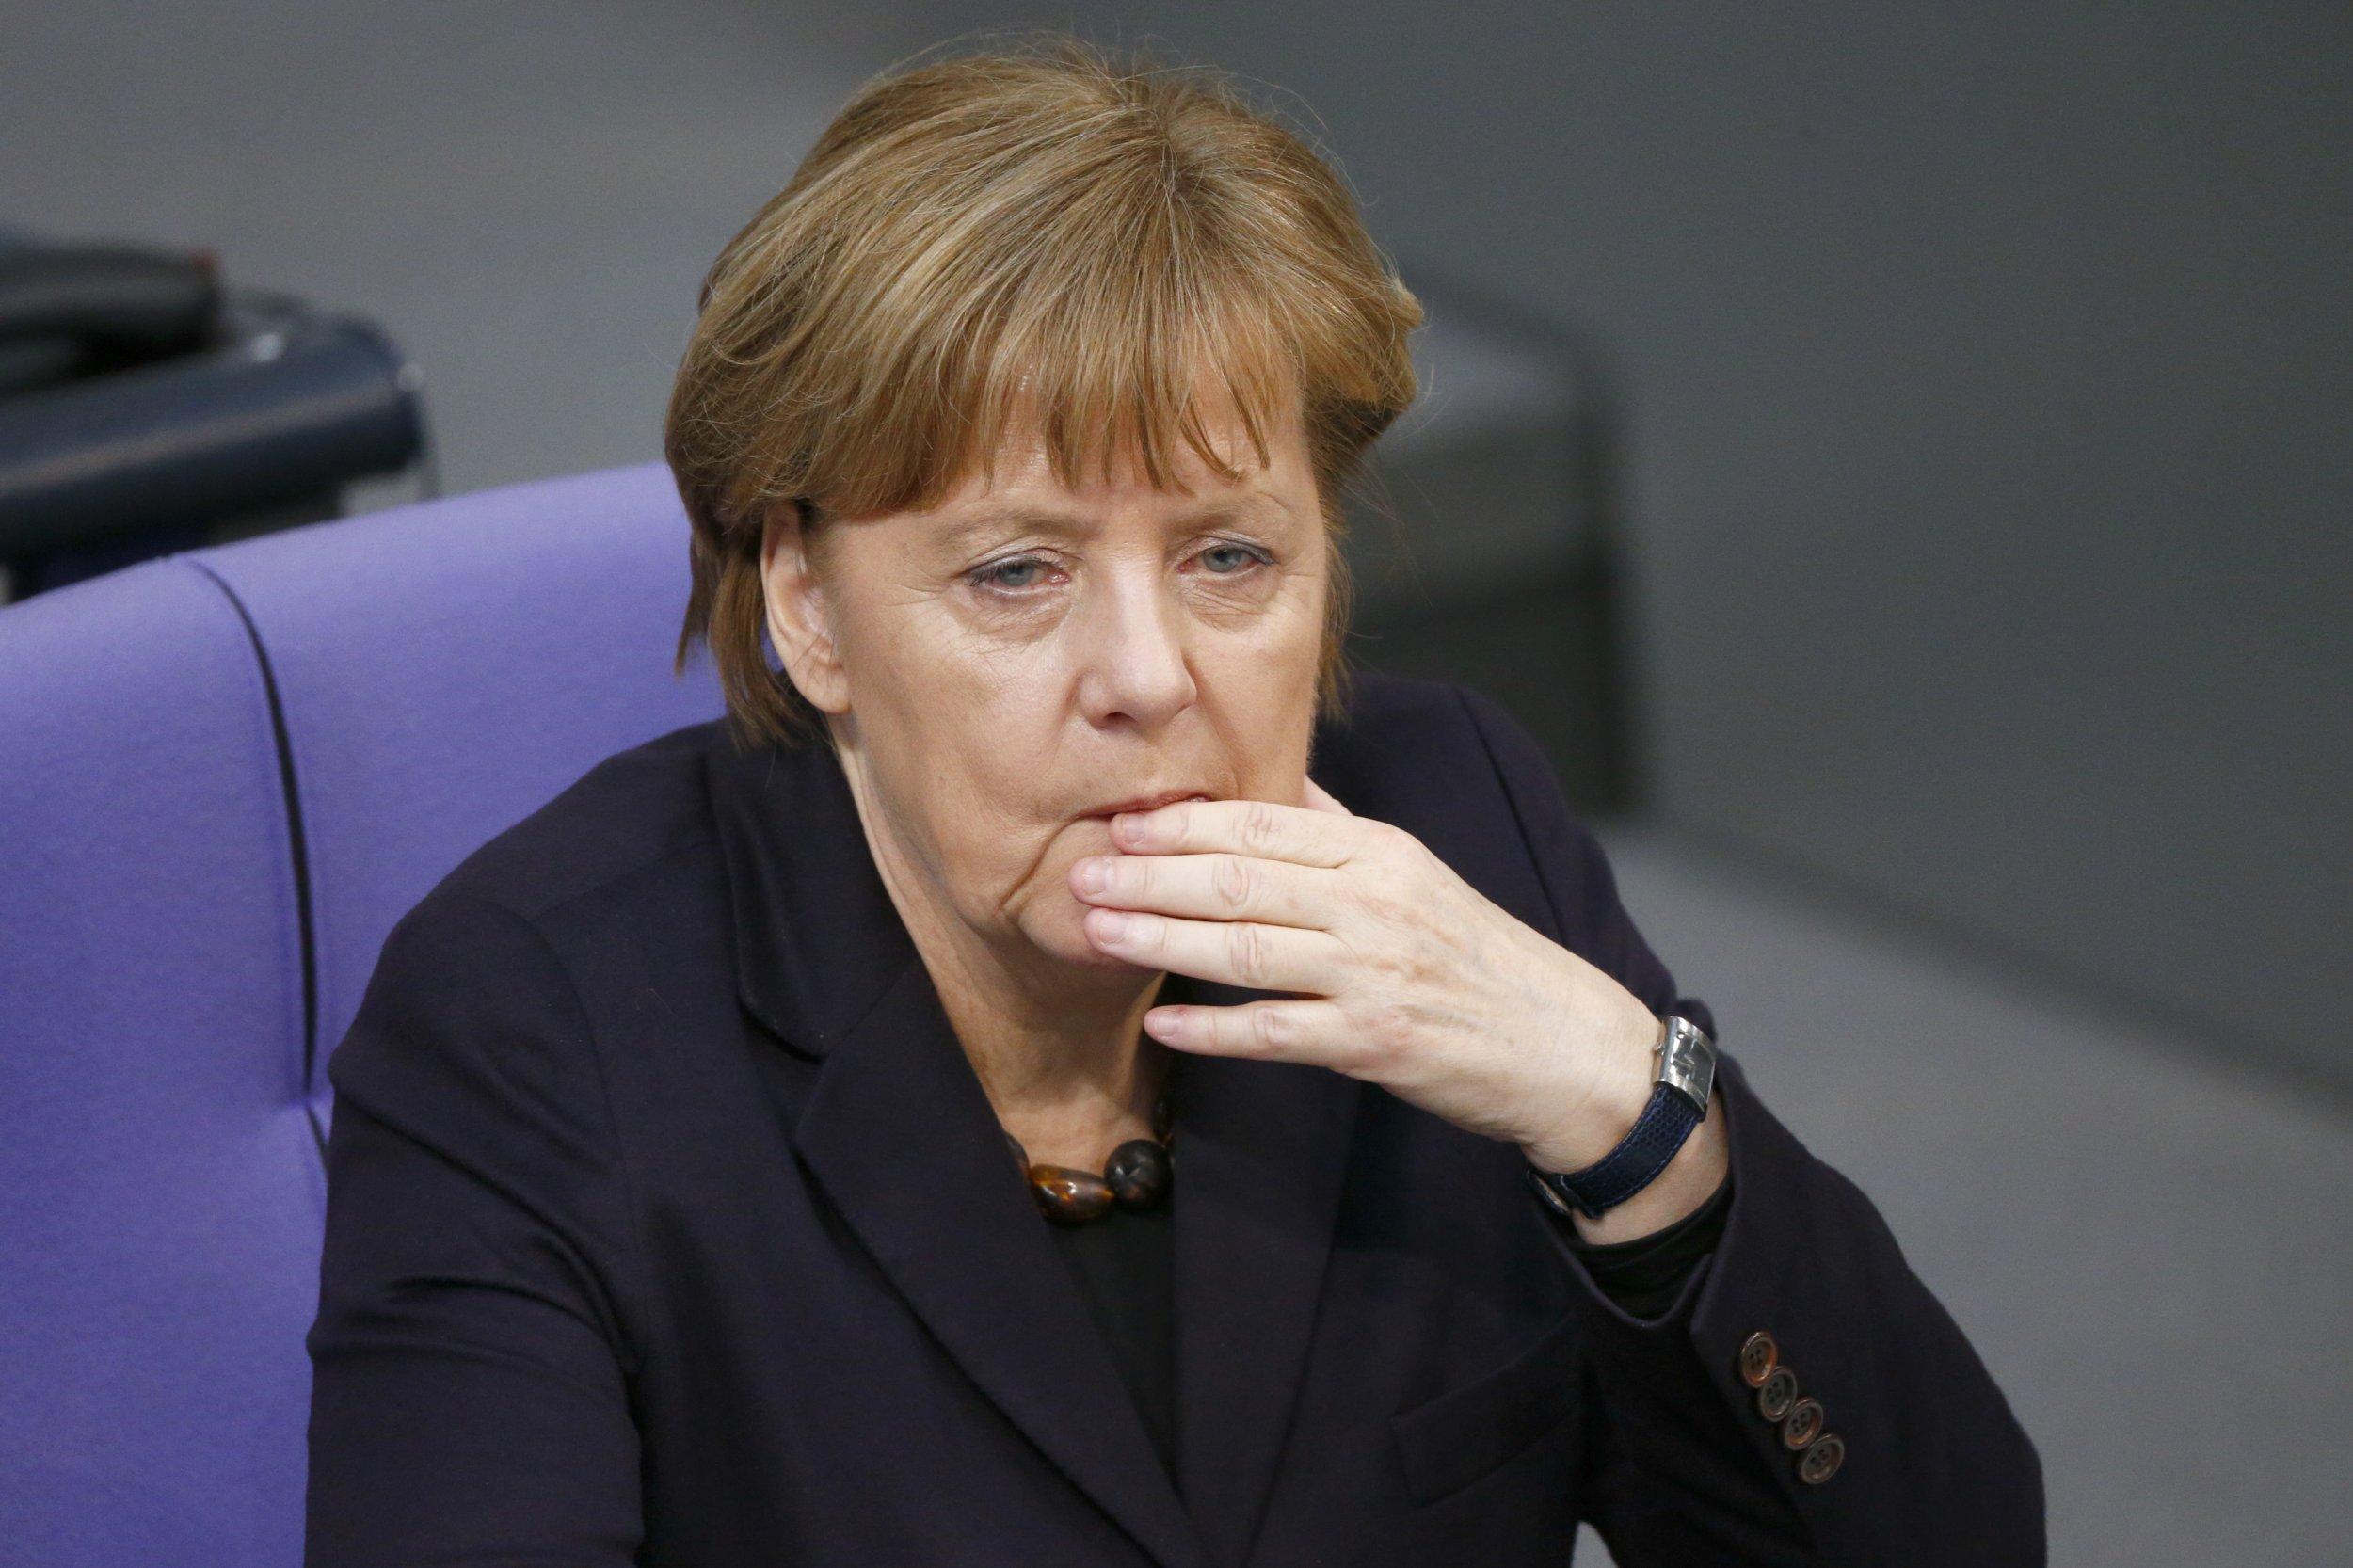 03_14_Merkel_Election_01